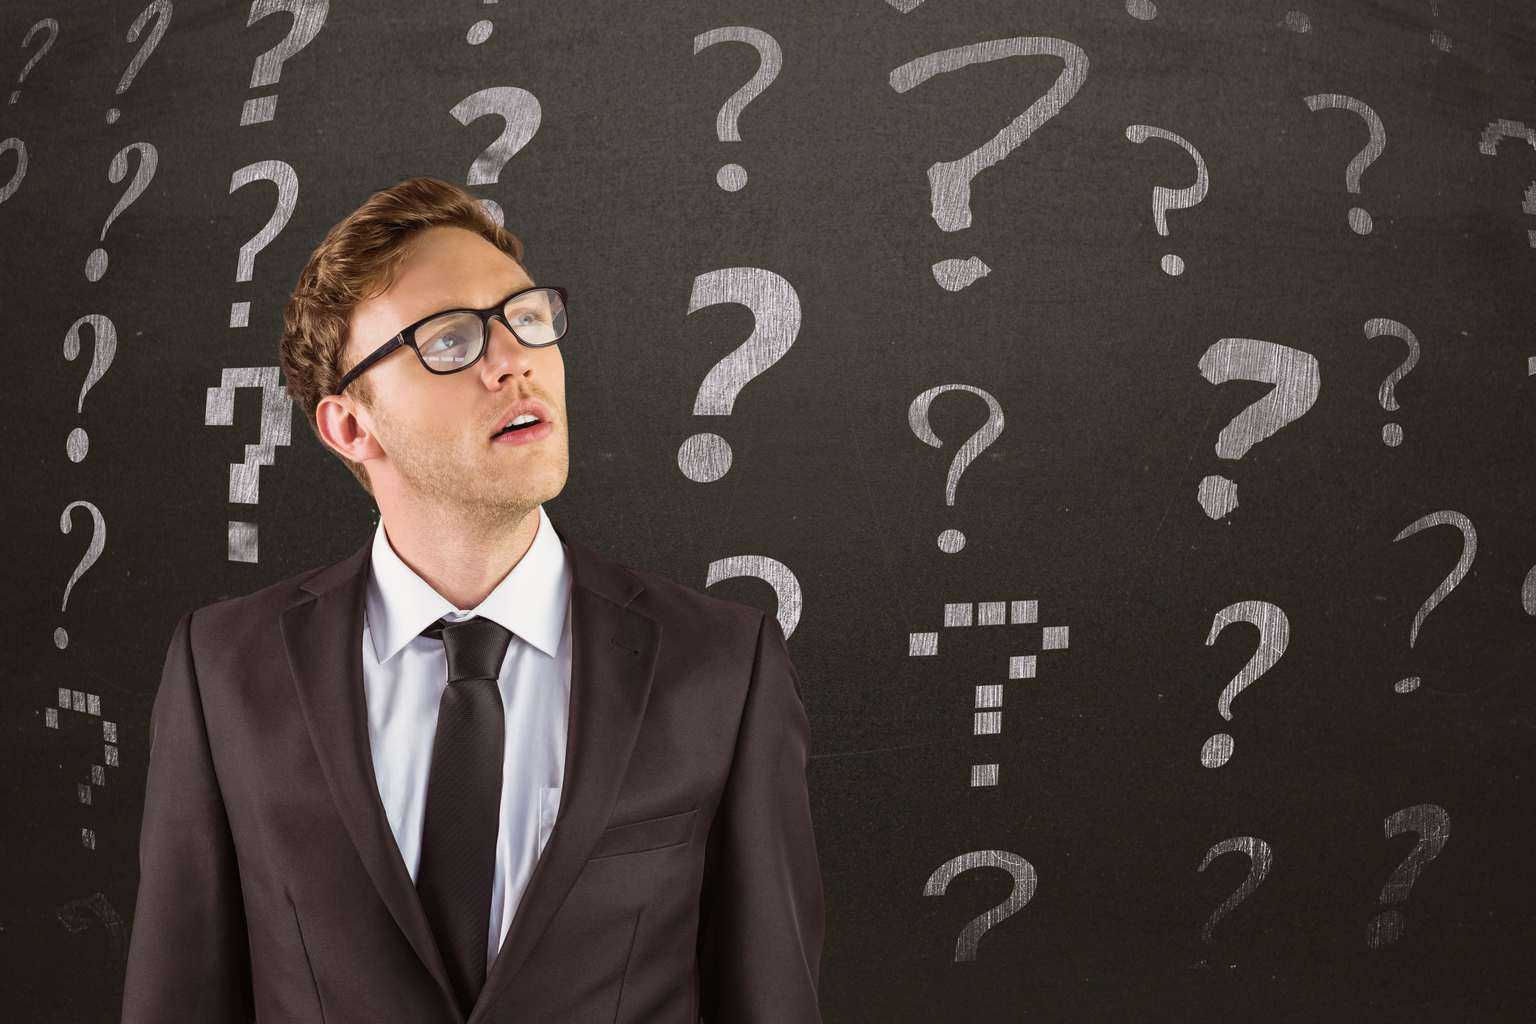 【Q&A】識学キャリアの気になる疑問点を全て解決!